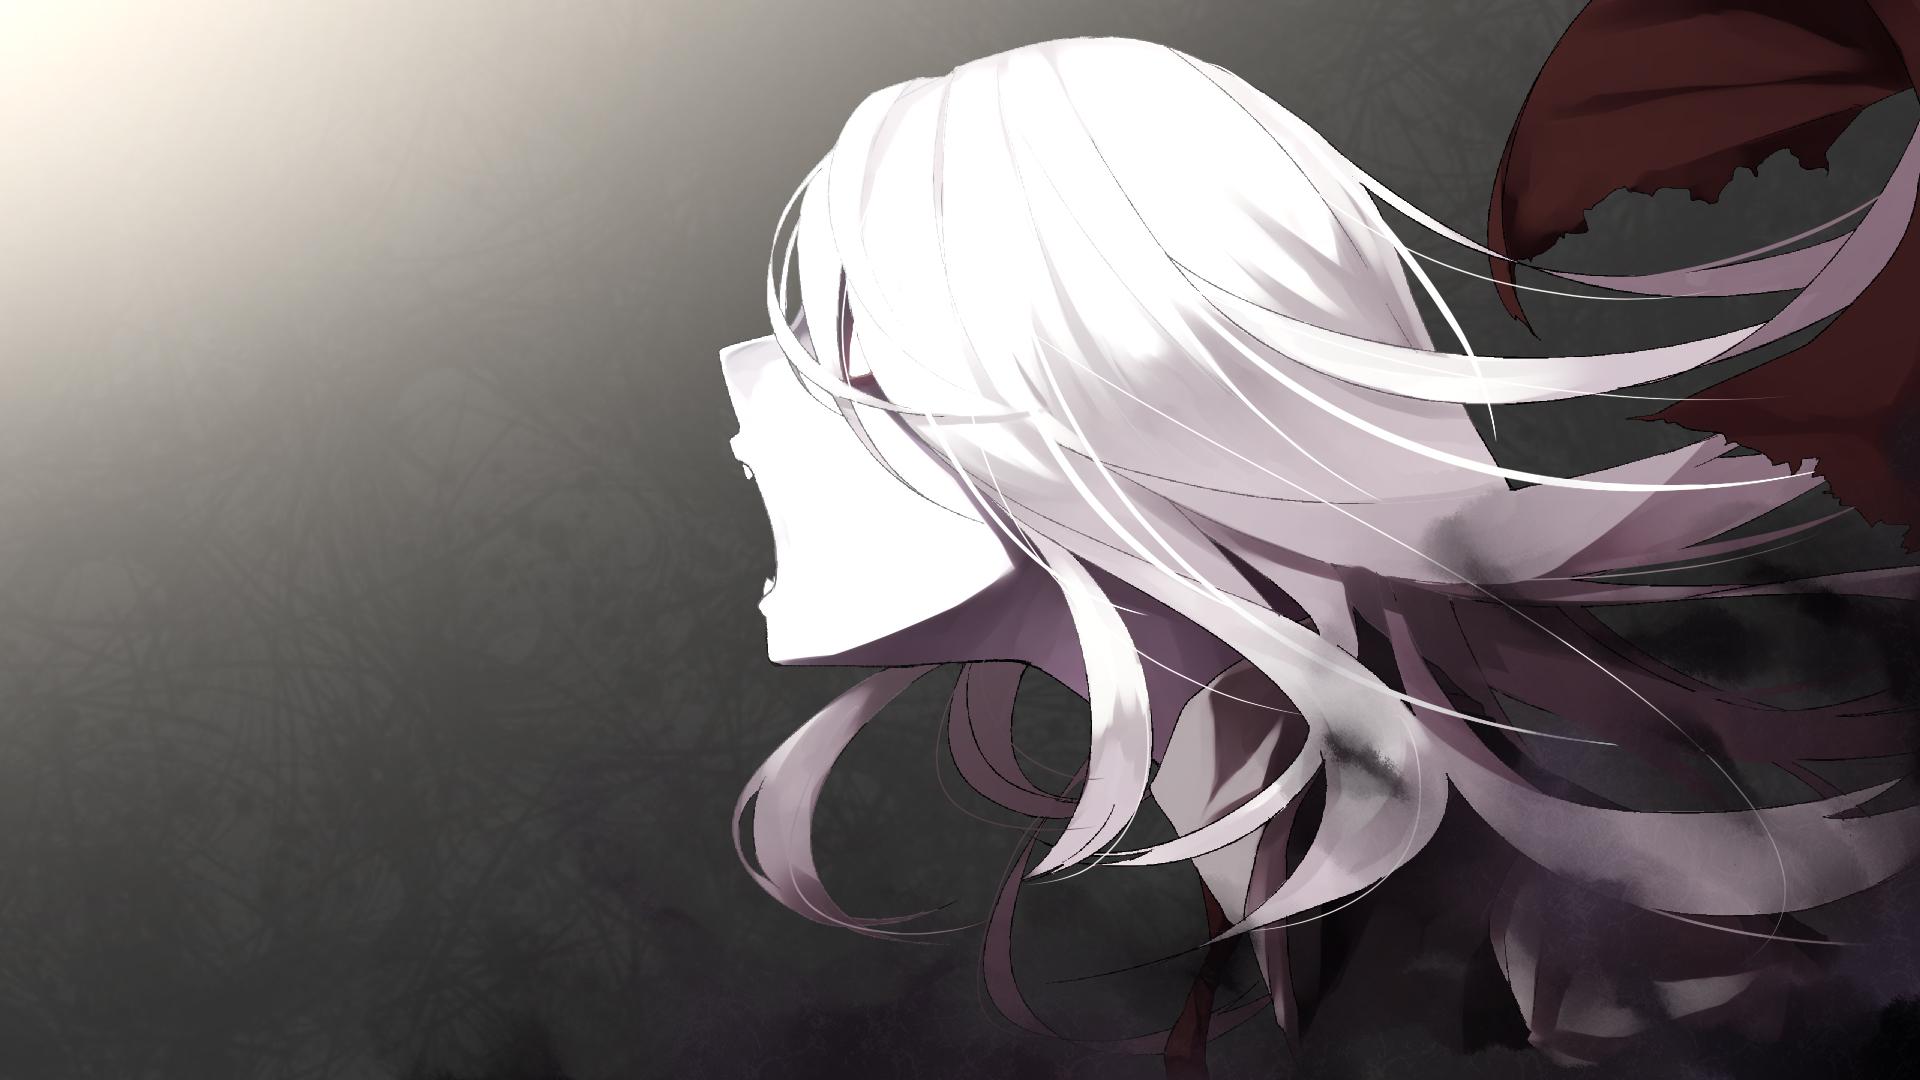 Touhou Hd Wallpaper Zerochan Anime Image Board